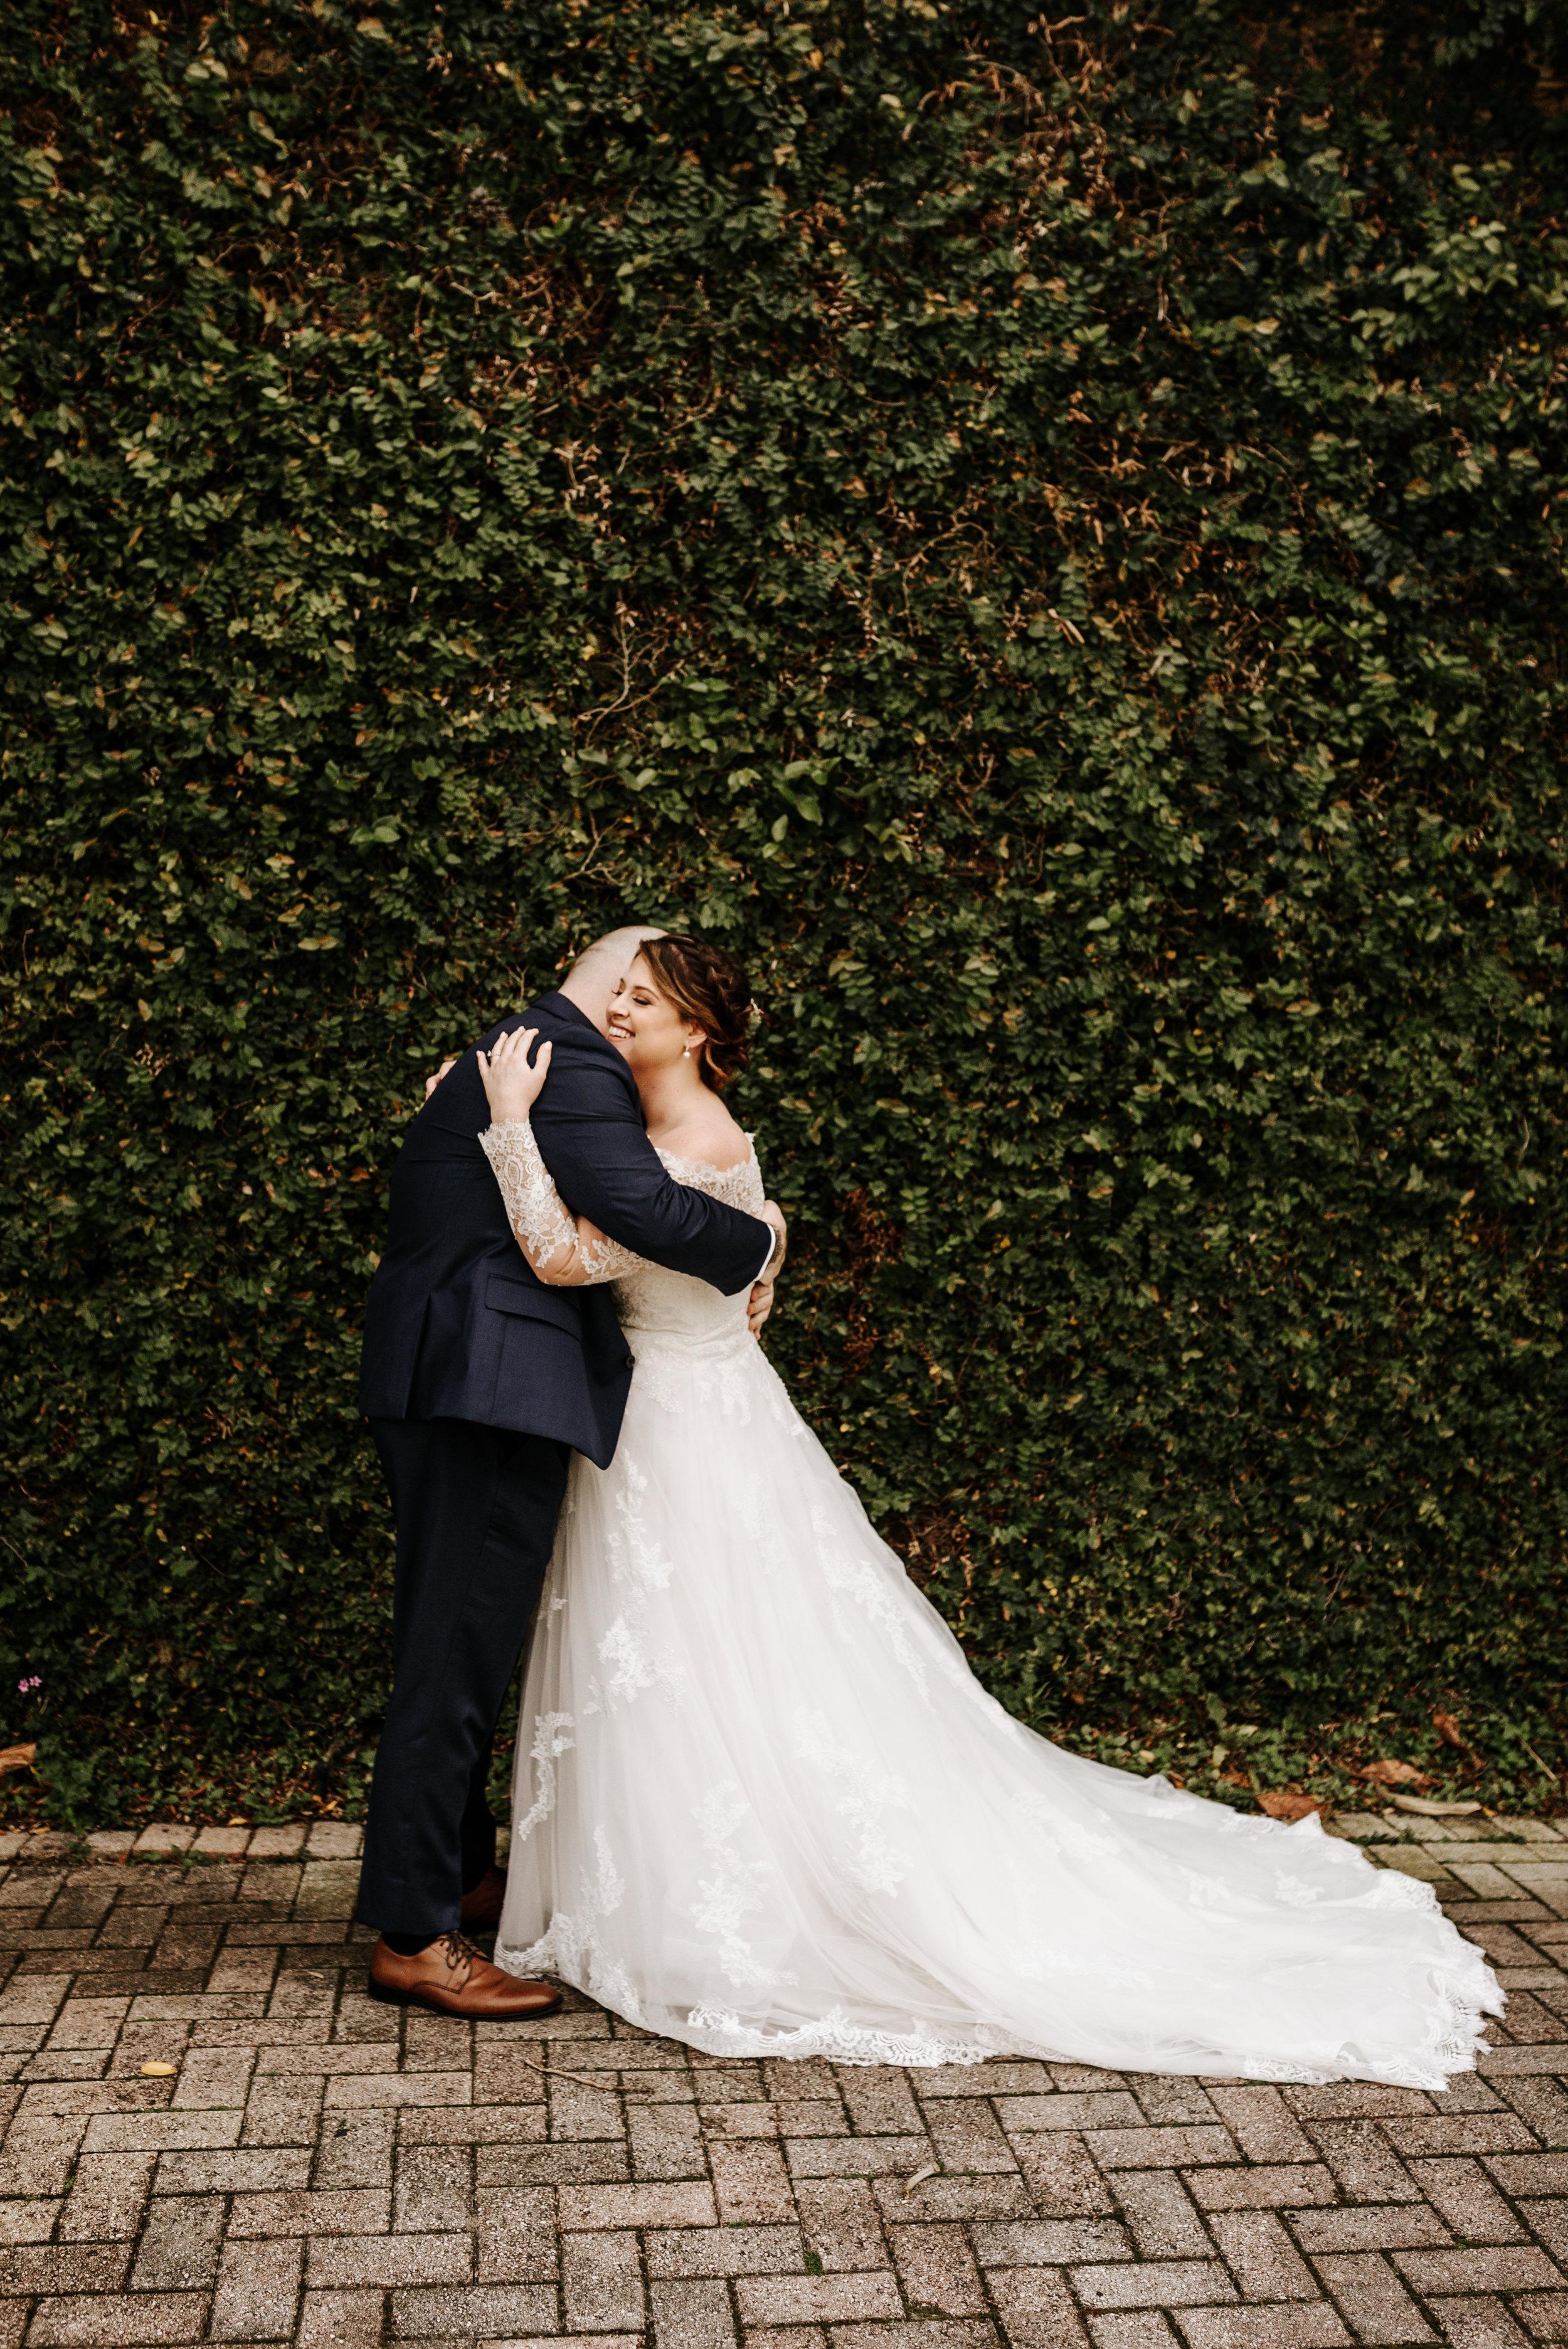 Madison-Chapman-Wedding-The-Sunday-House-Delray-Beach-Photography-by-V-4894.jpg